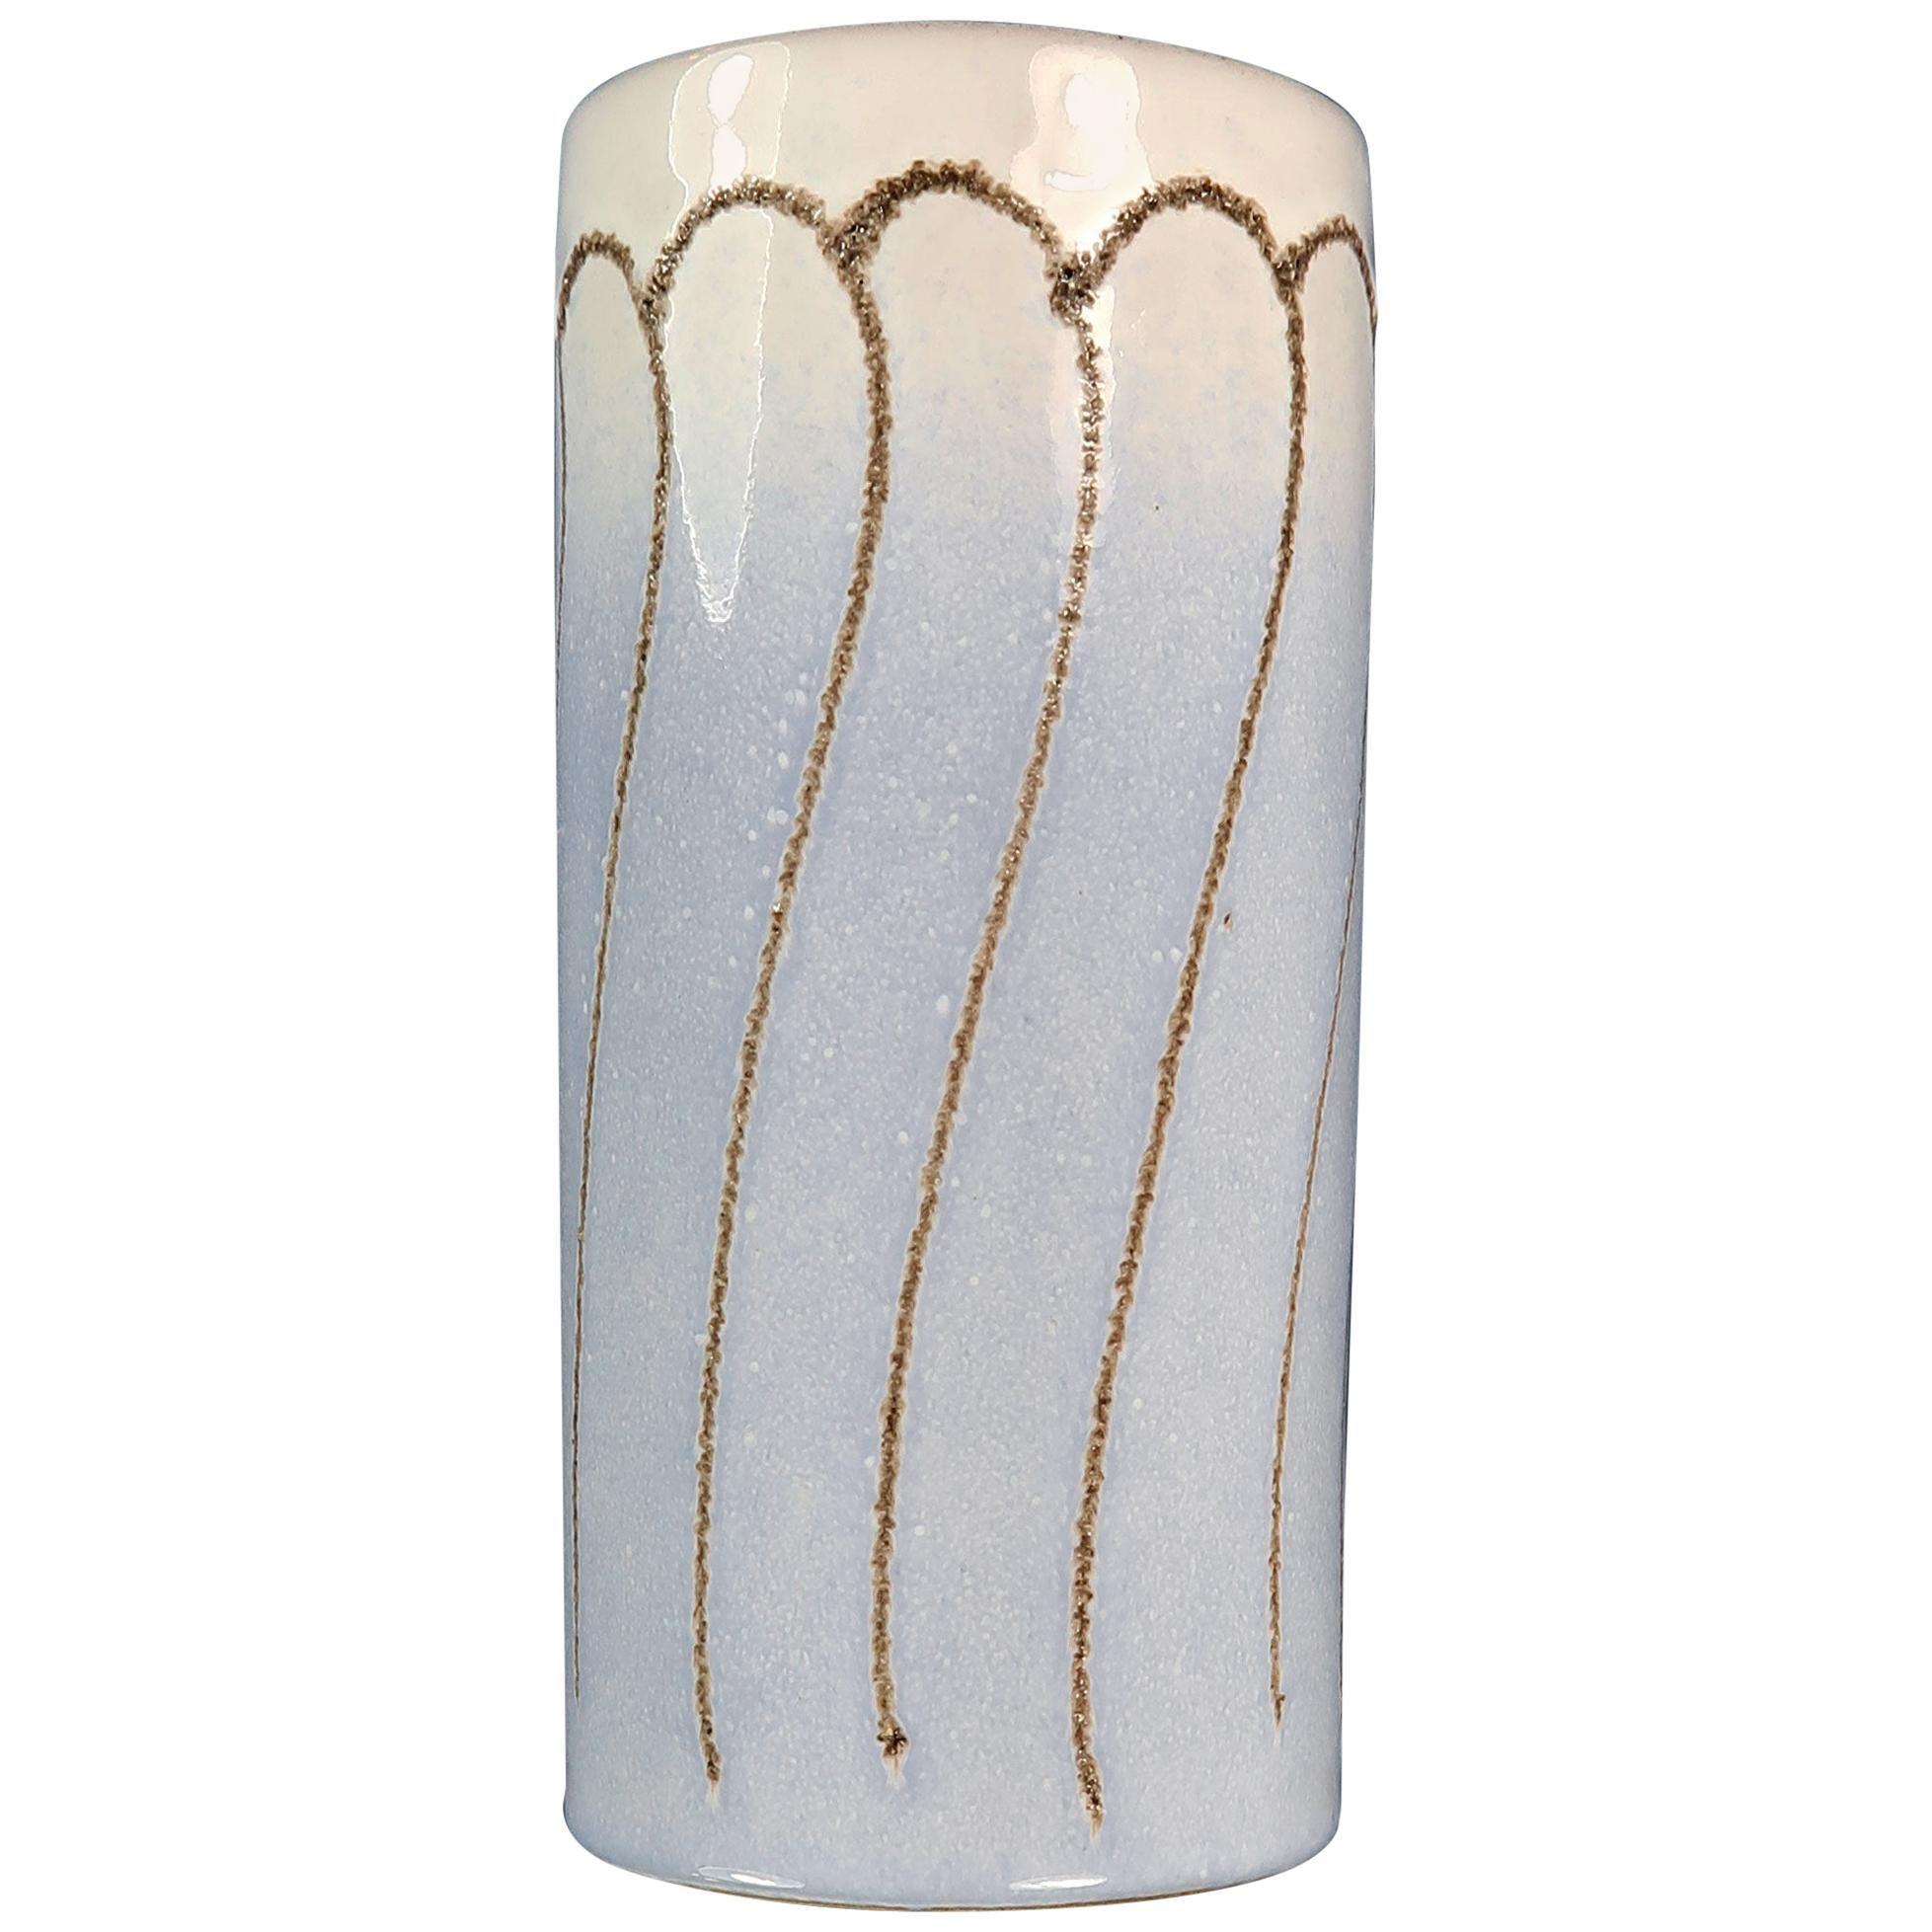 Vintage White and Light Blue East German Ceramic Vase by Strehla, 1960s